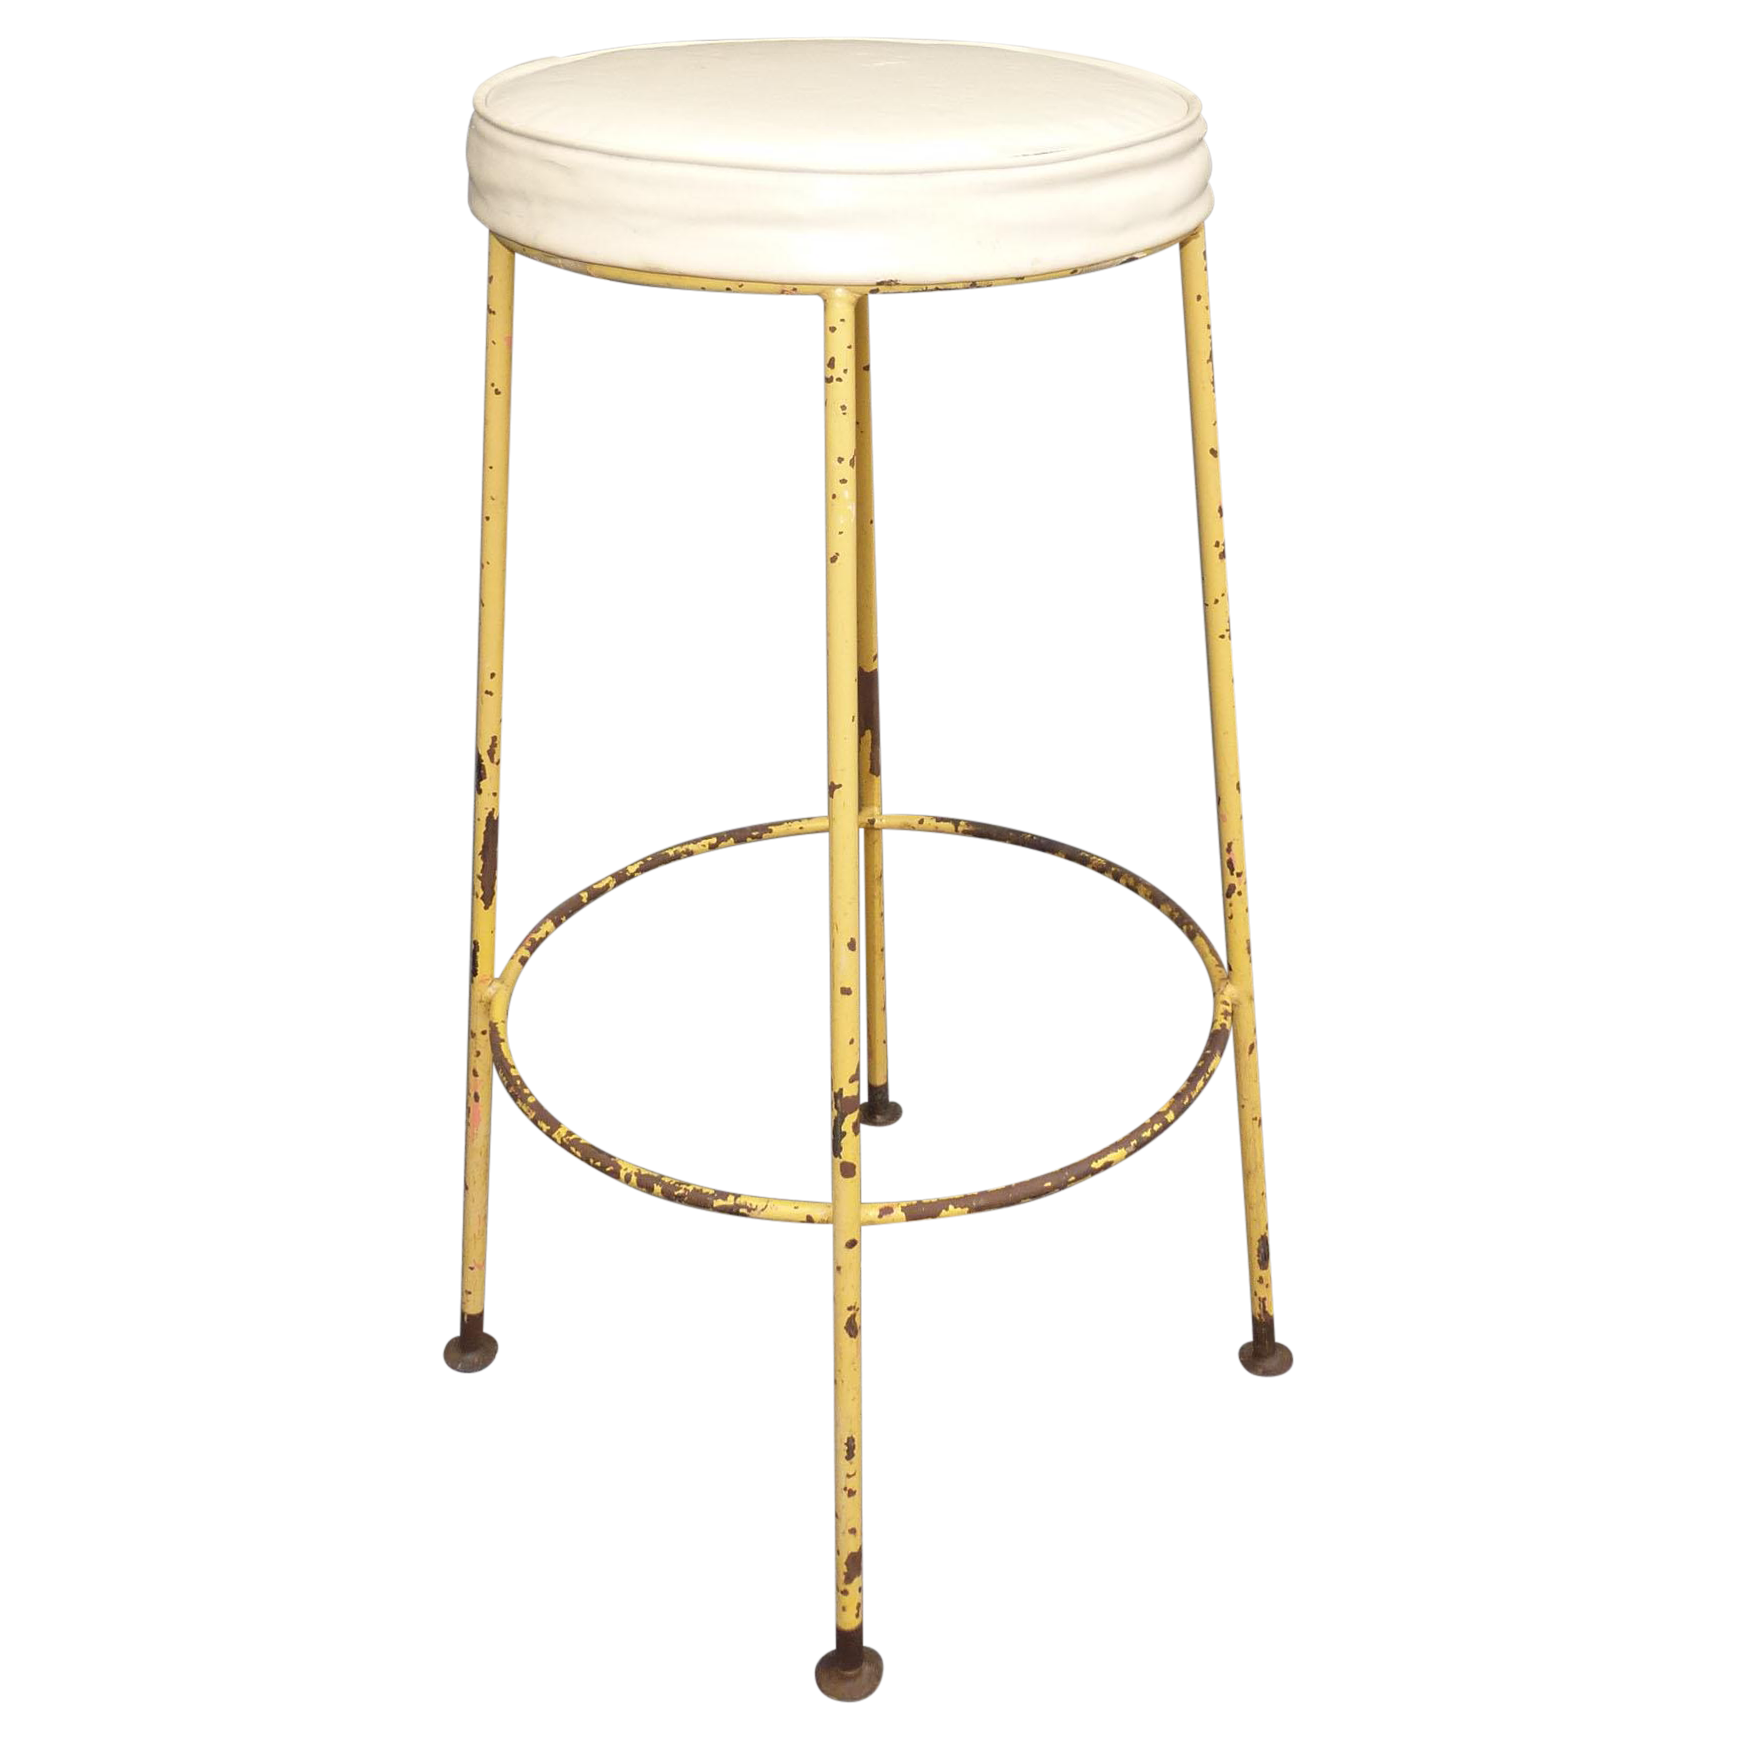 Vintage Yellow Metal amp White Vinyl Bar Stool Chairish : vintage yellow metal and white vinyl bar stool 6885aspectfitampwidth640ampheight640 from www.chairish.com size 640 x 640 jpeg 20kB